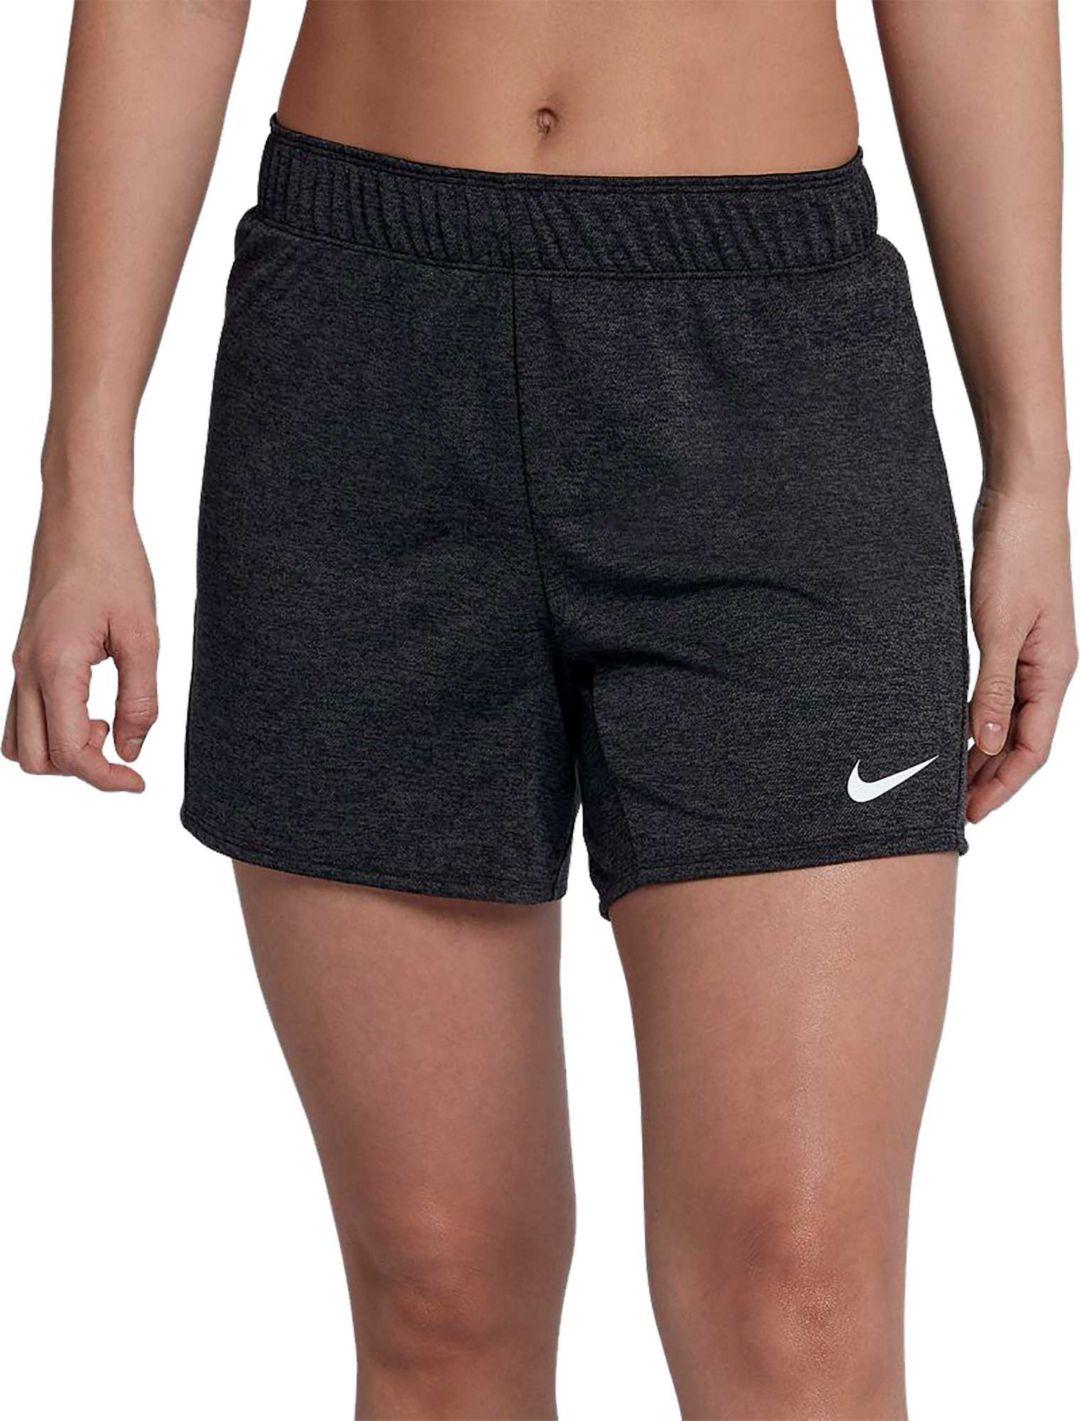 b94cdd21d2348 Nike Women's 5'' Attack Training Shorts | DICK'S Sporting Goods